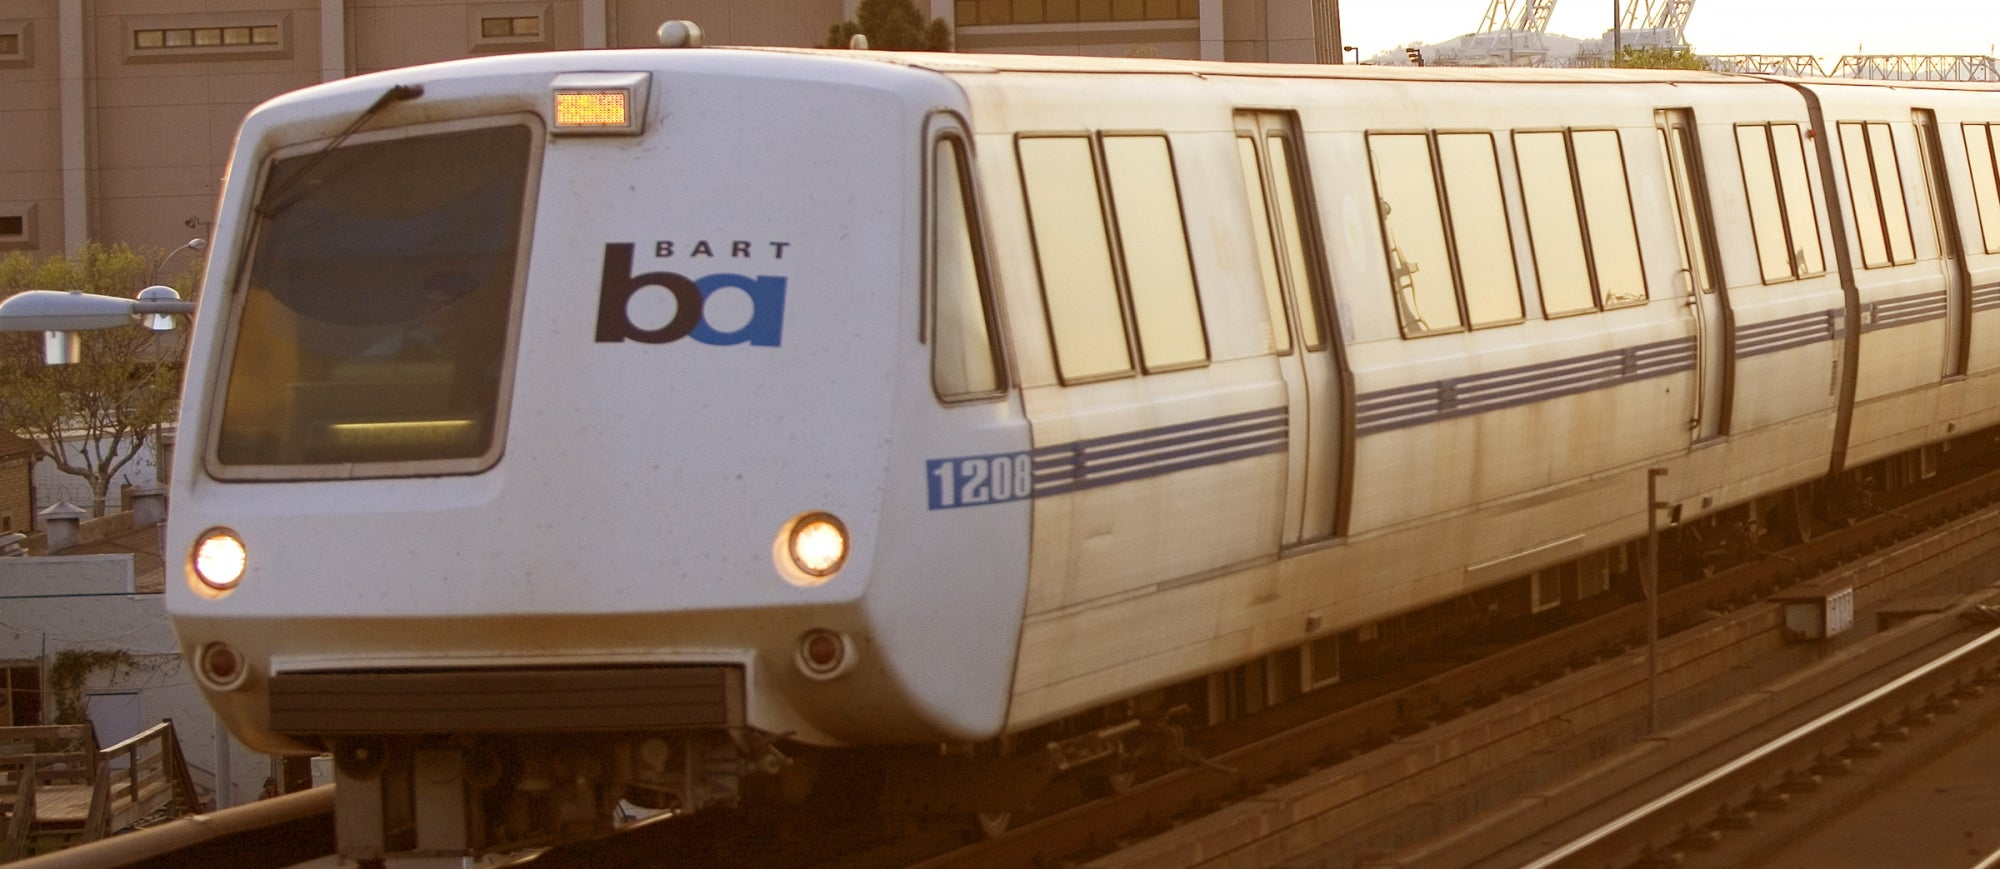 BART train near West Oakland station